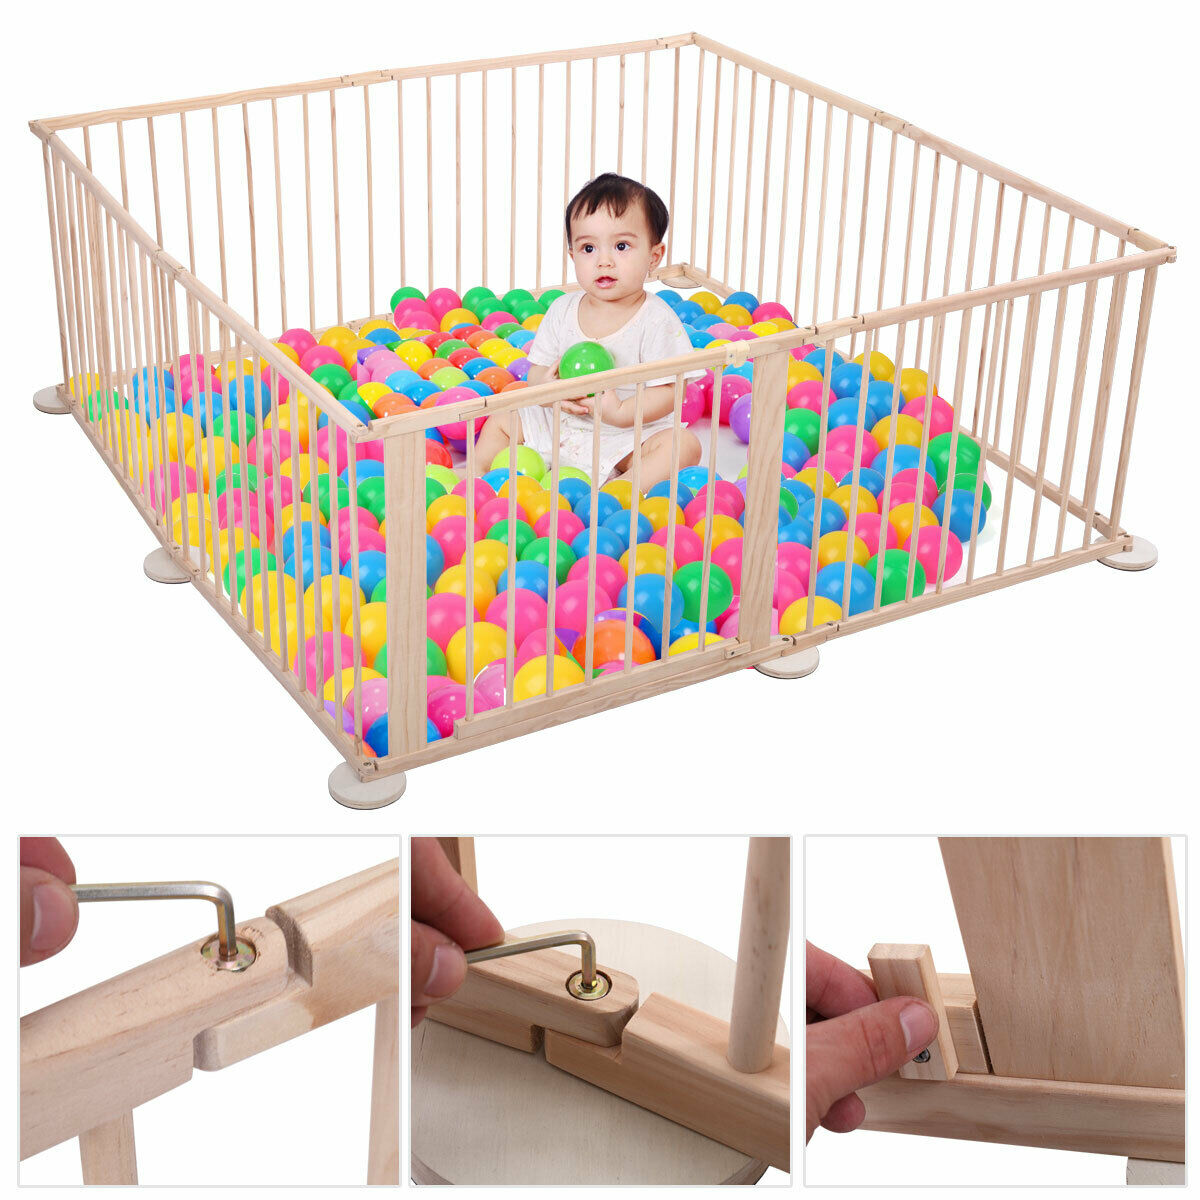 8 Panel Baby Playpen Foldable Wooden Frame Kids Play Center